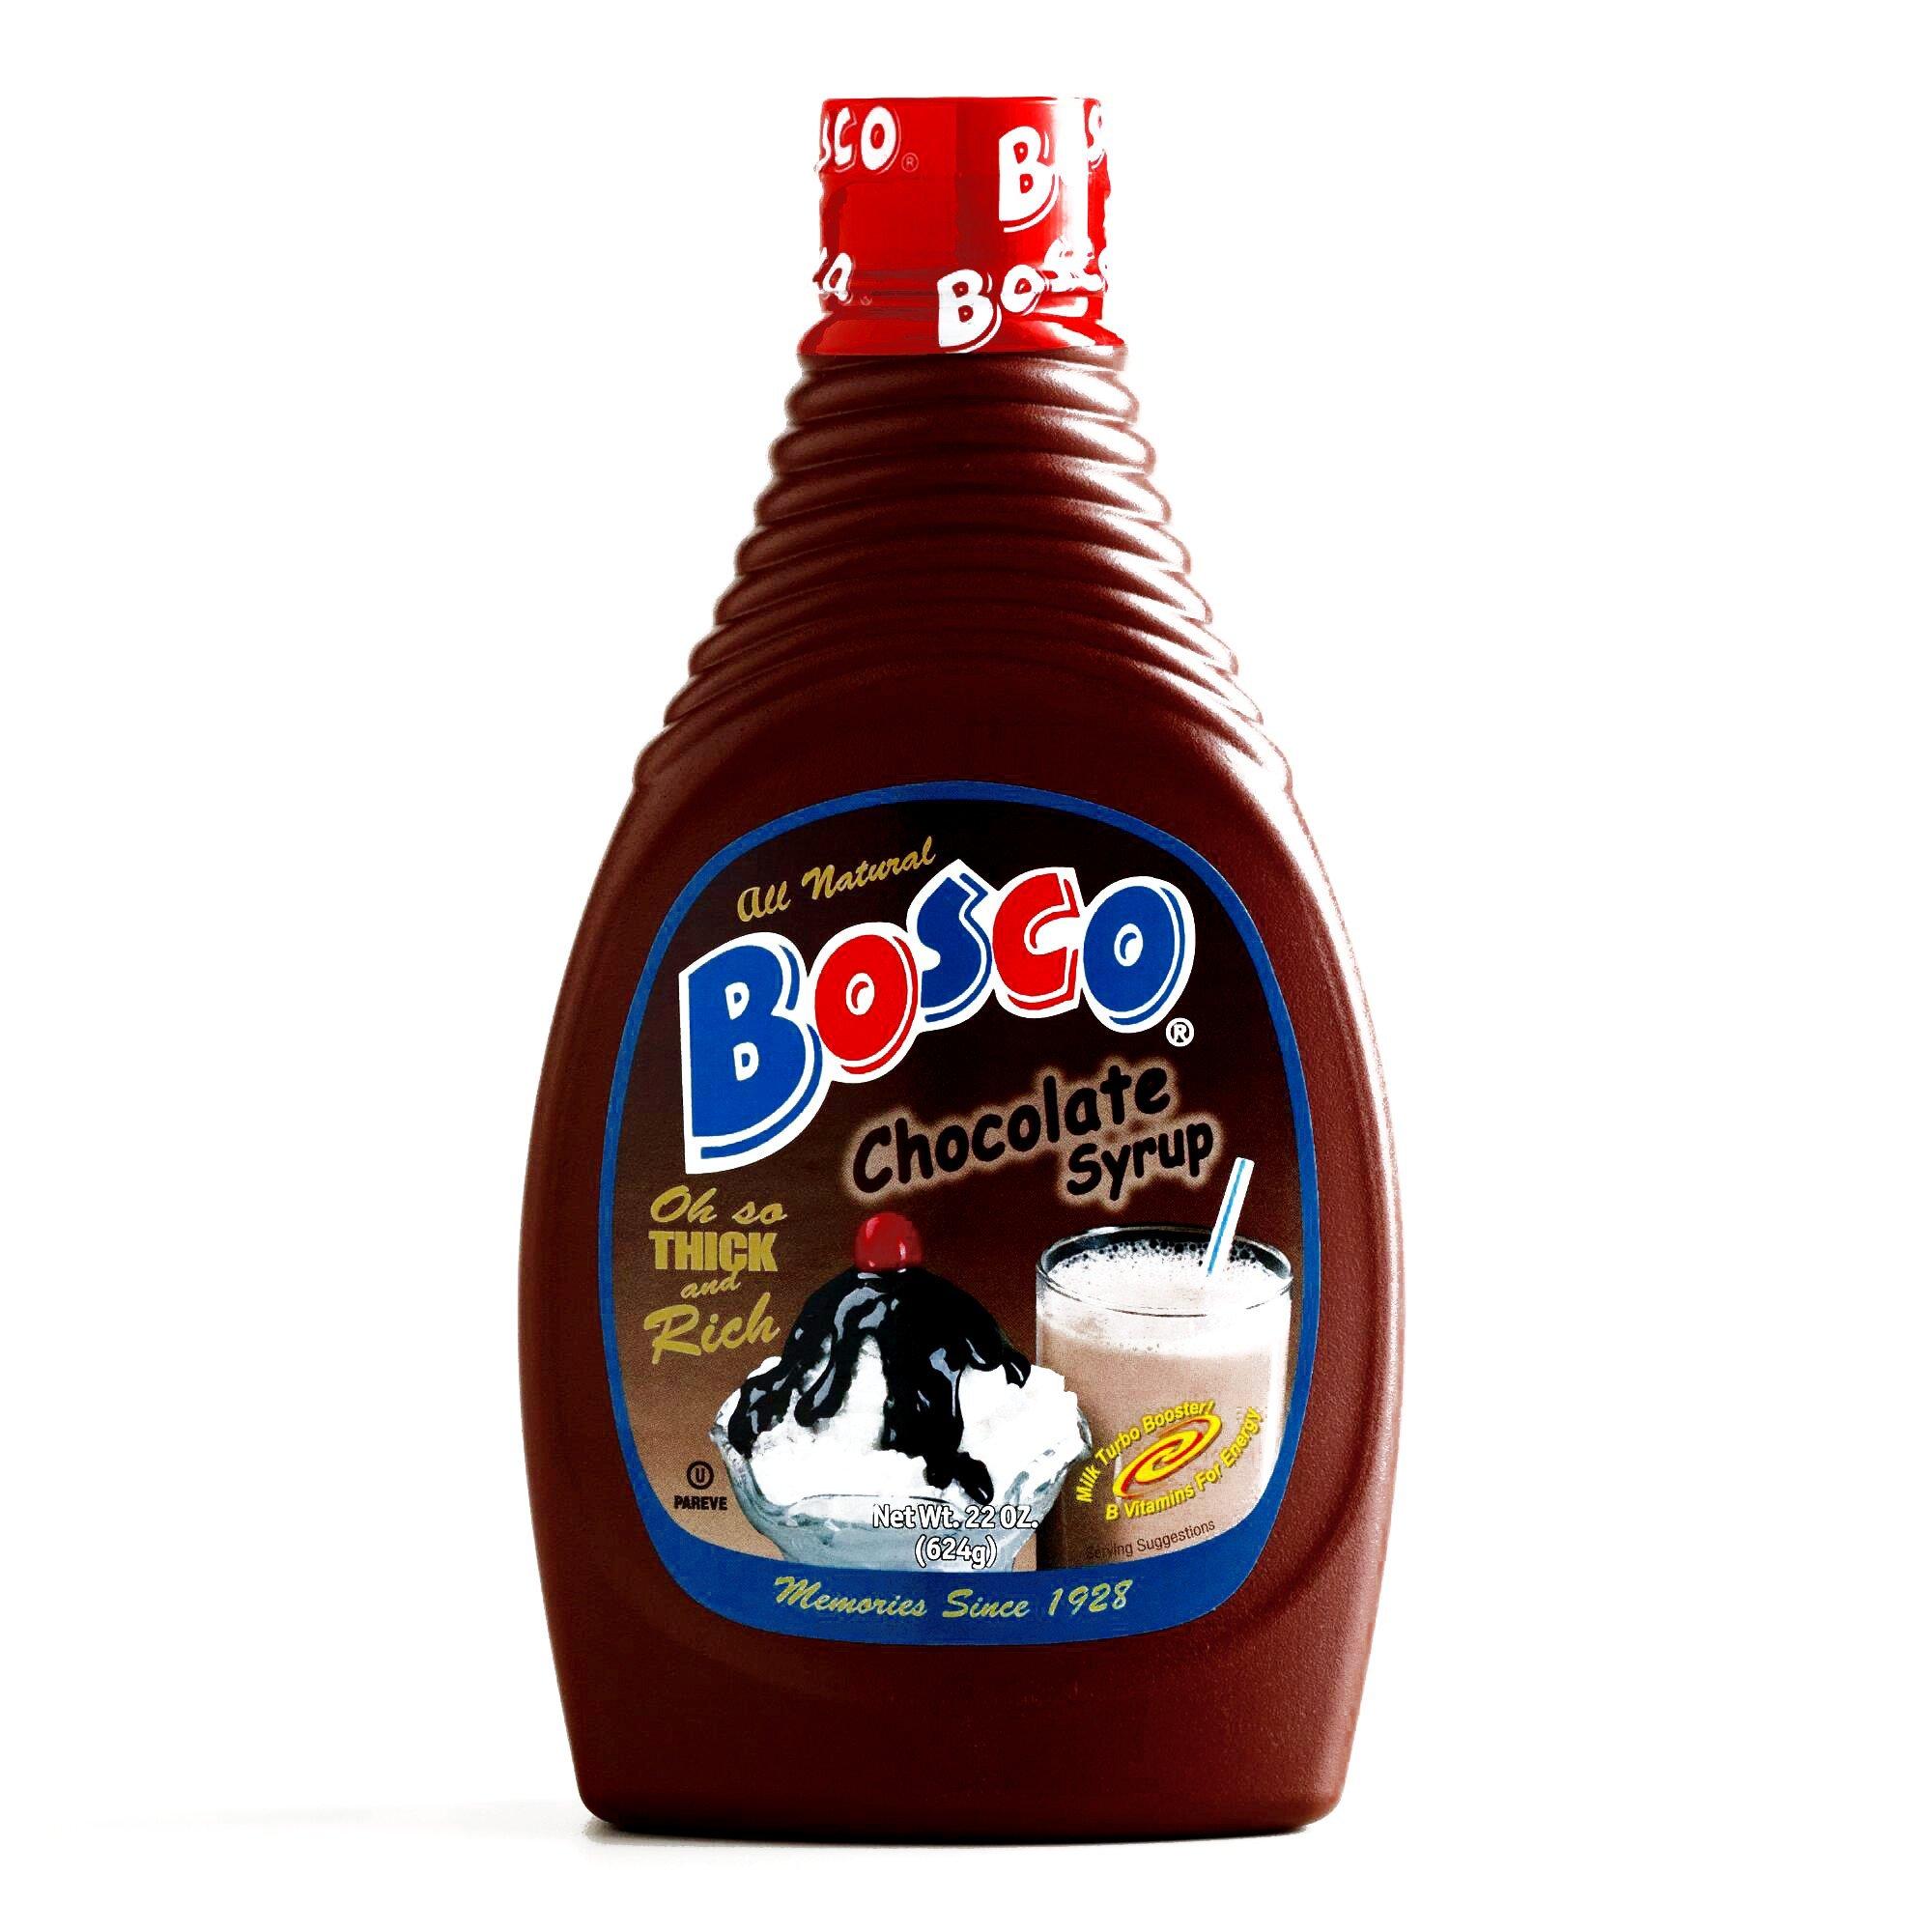 Bosco Chocolate Syrup 22 oz each (6 Items Per Order)